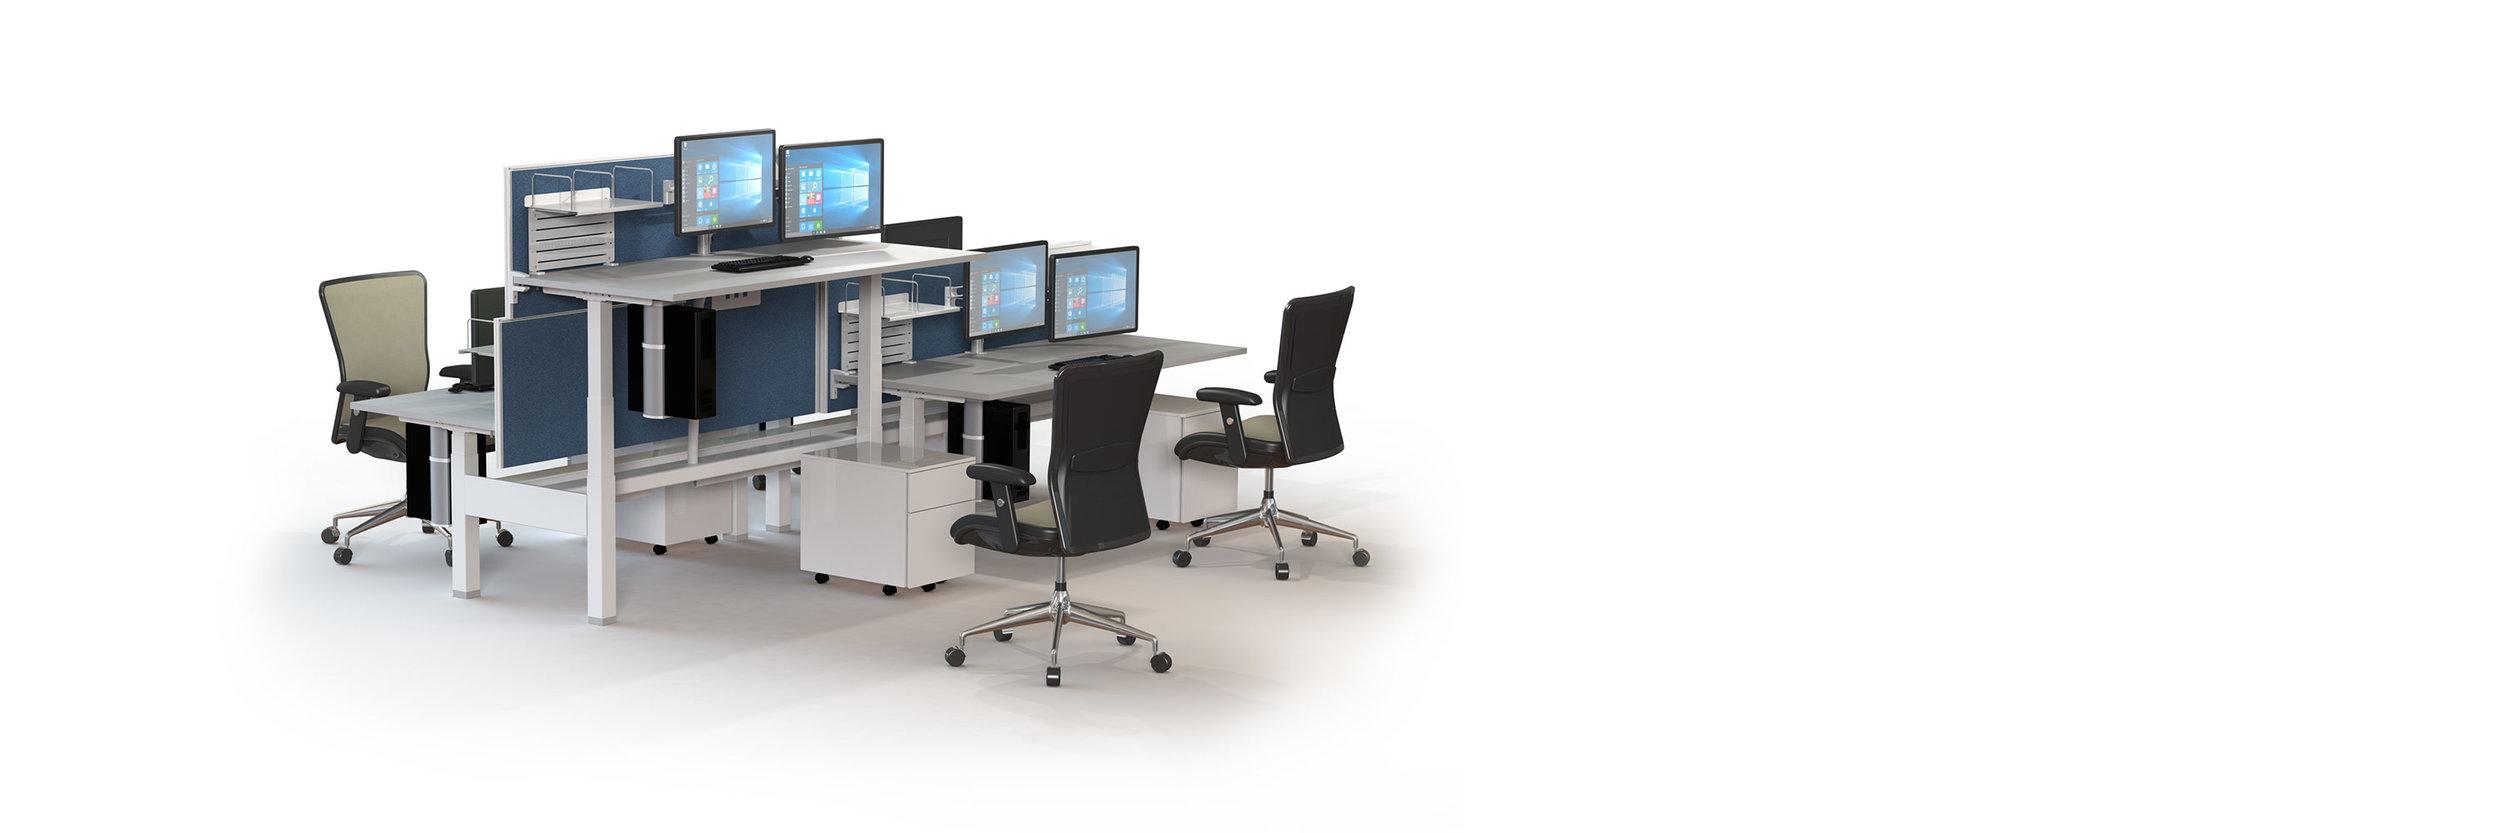 WorkstationSystems -